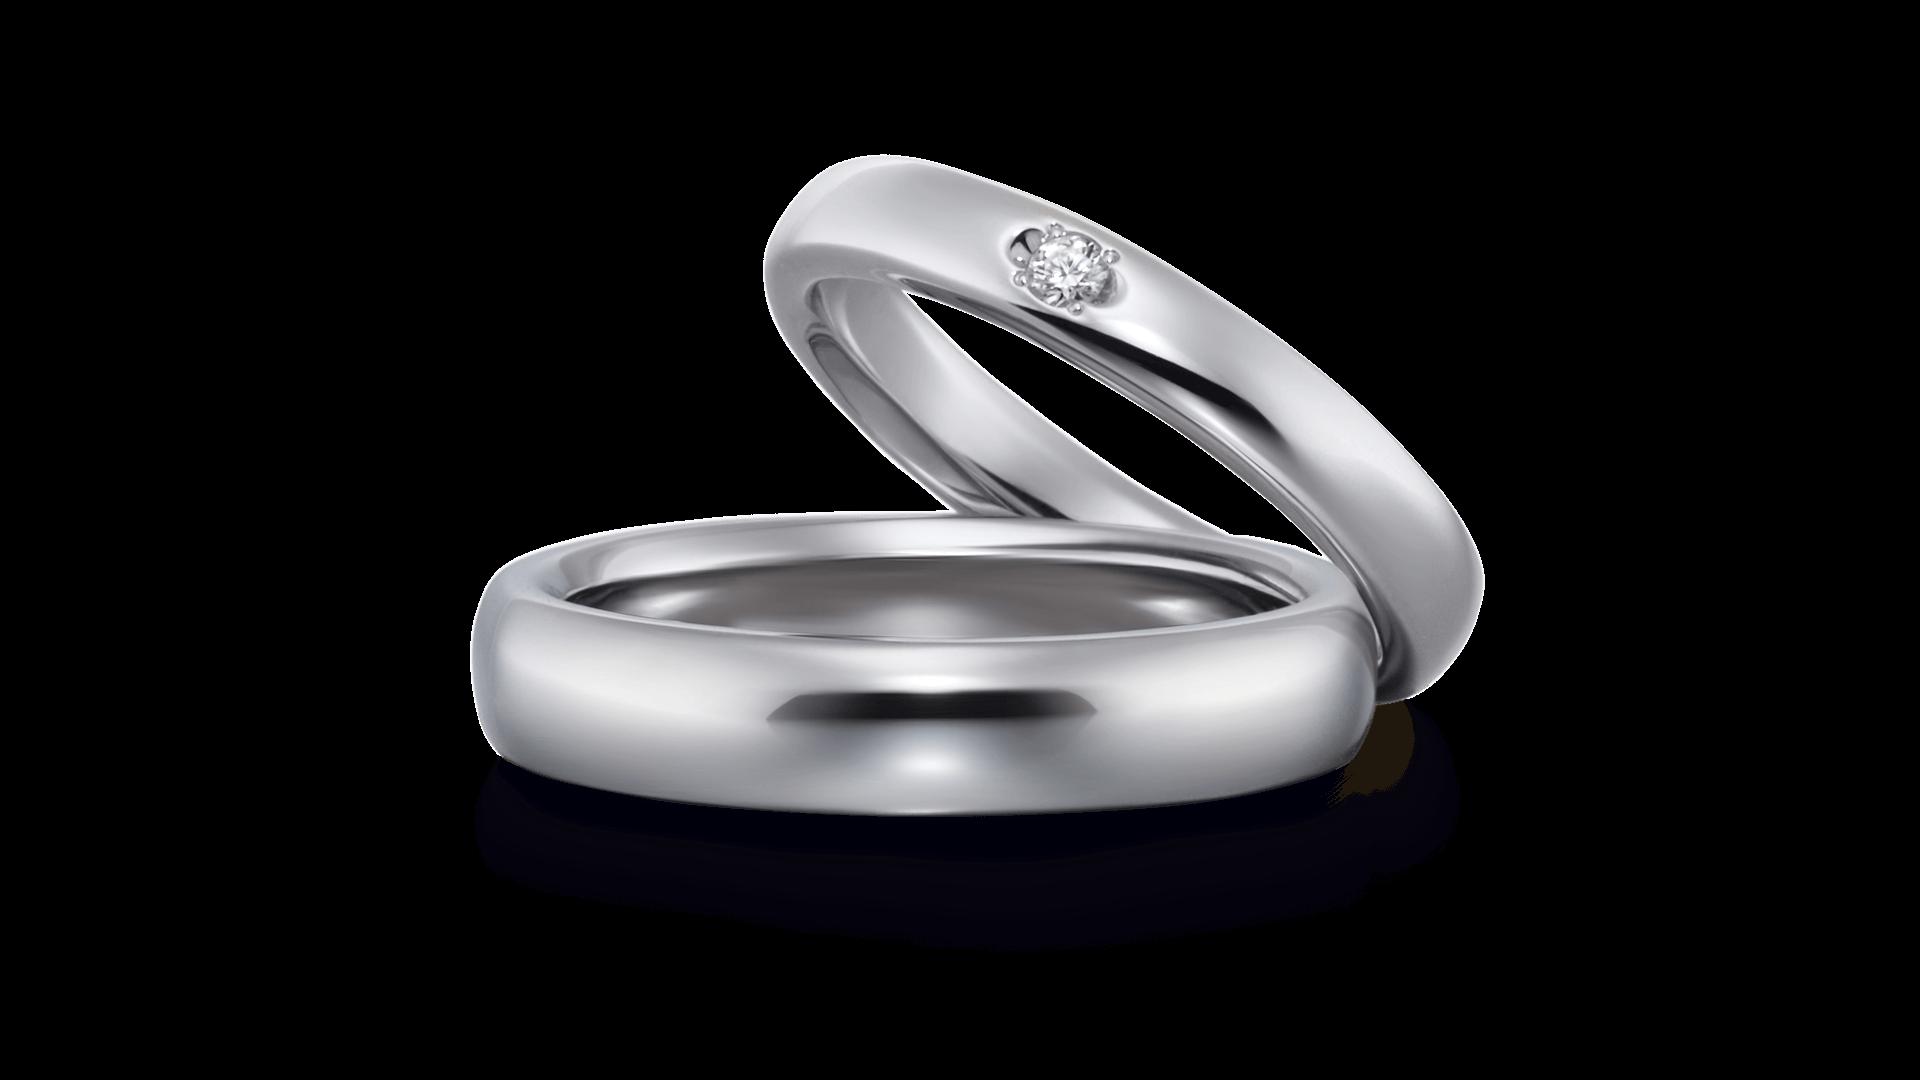 Origin Belief04 オリジンビリーフ04 | 結婚指輪サムネイル 2